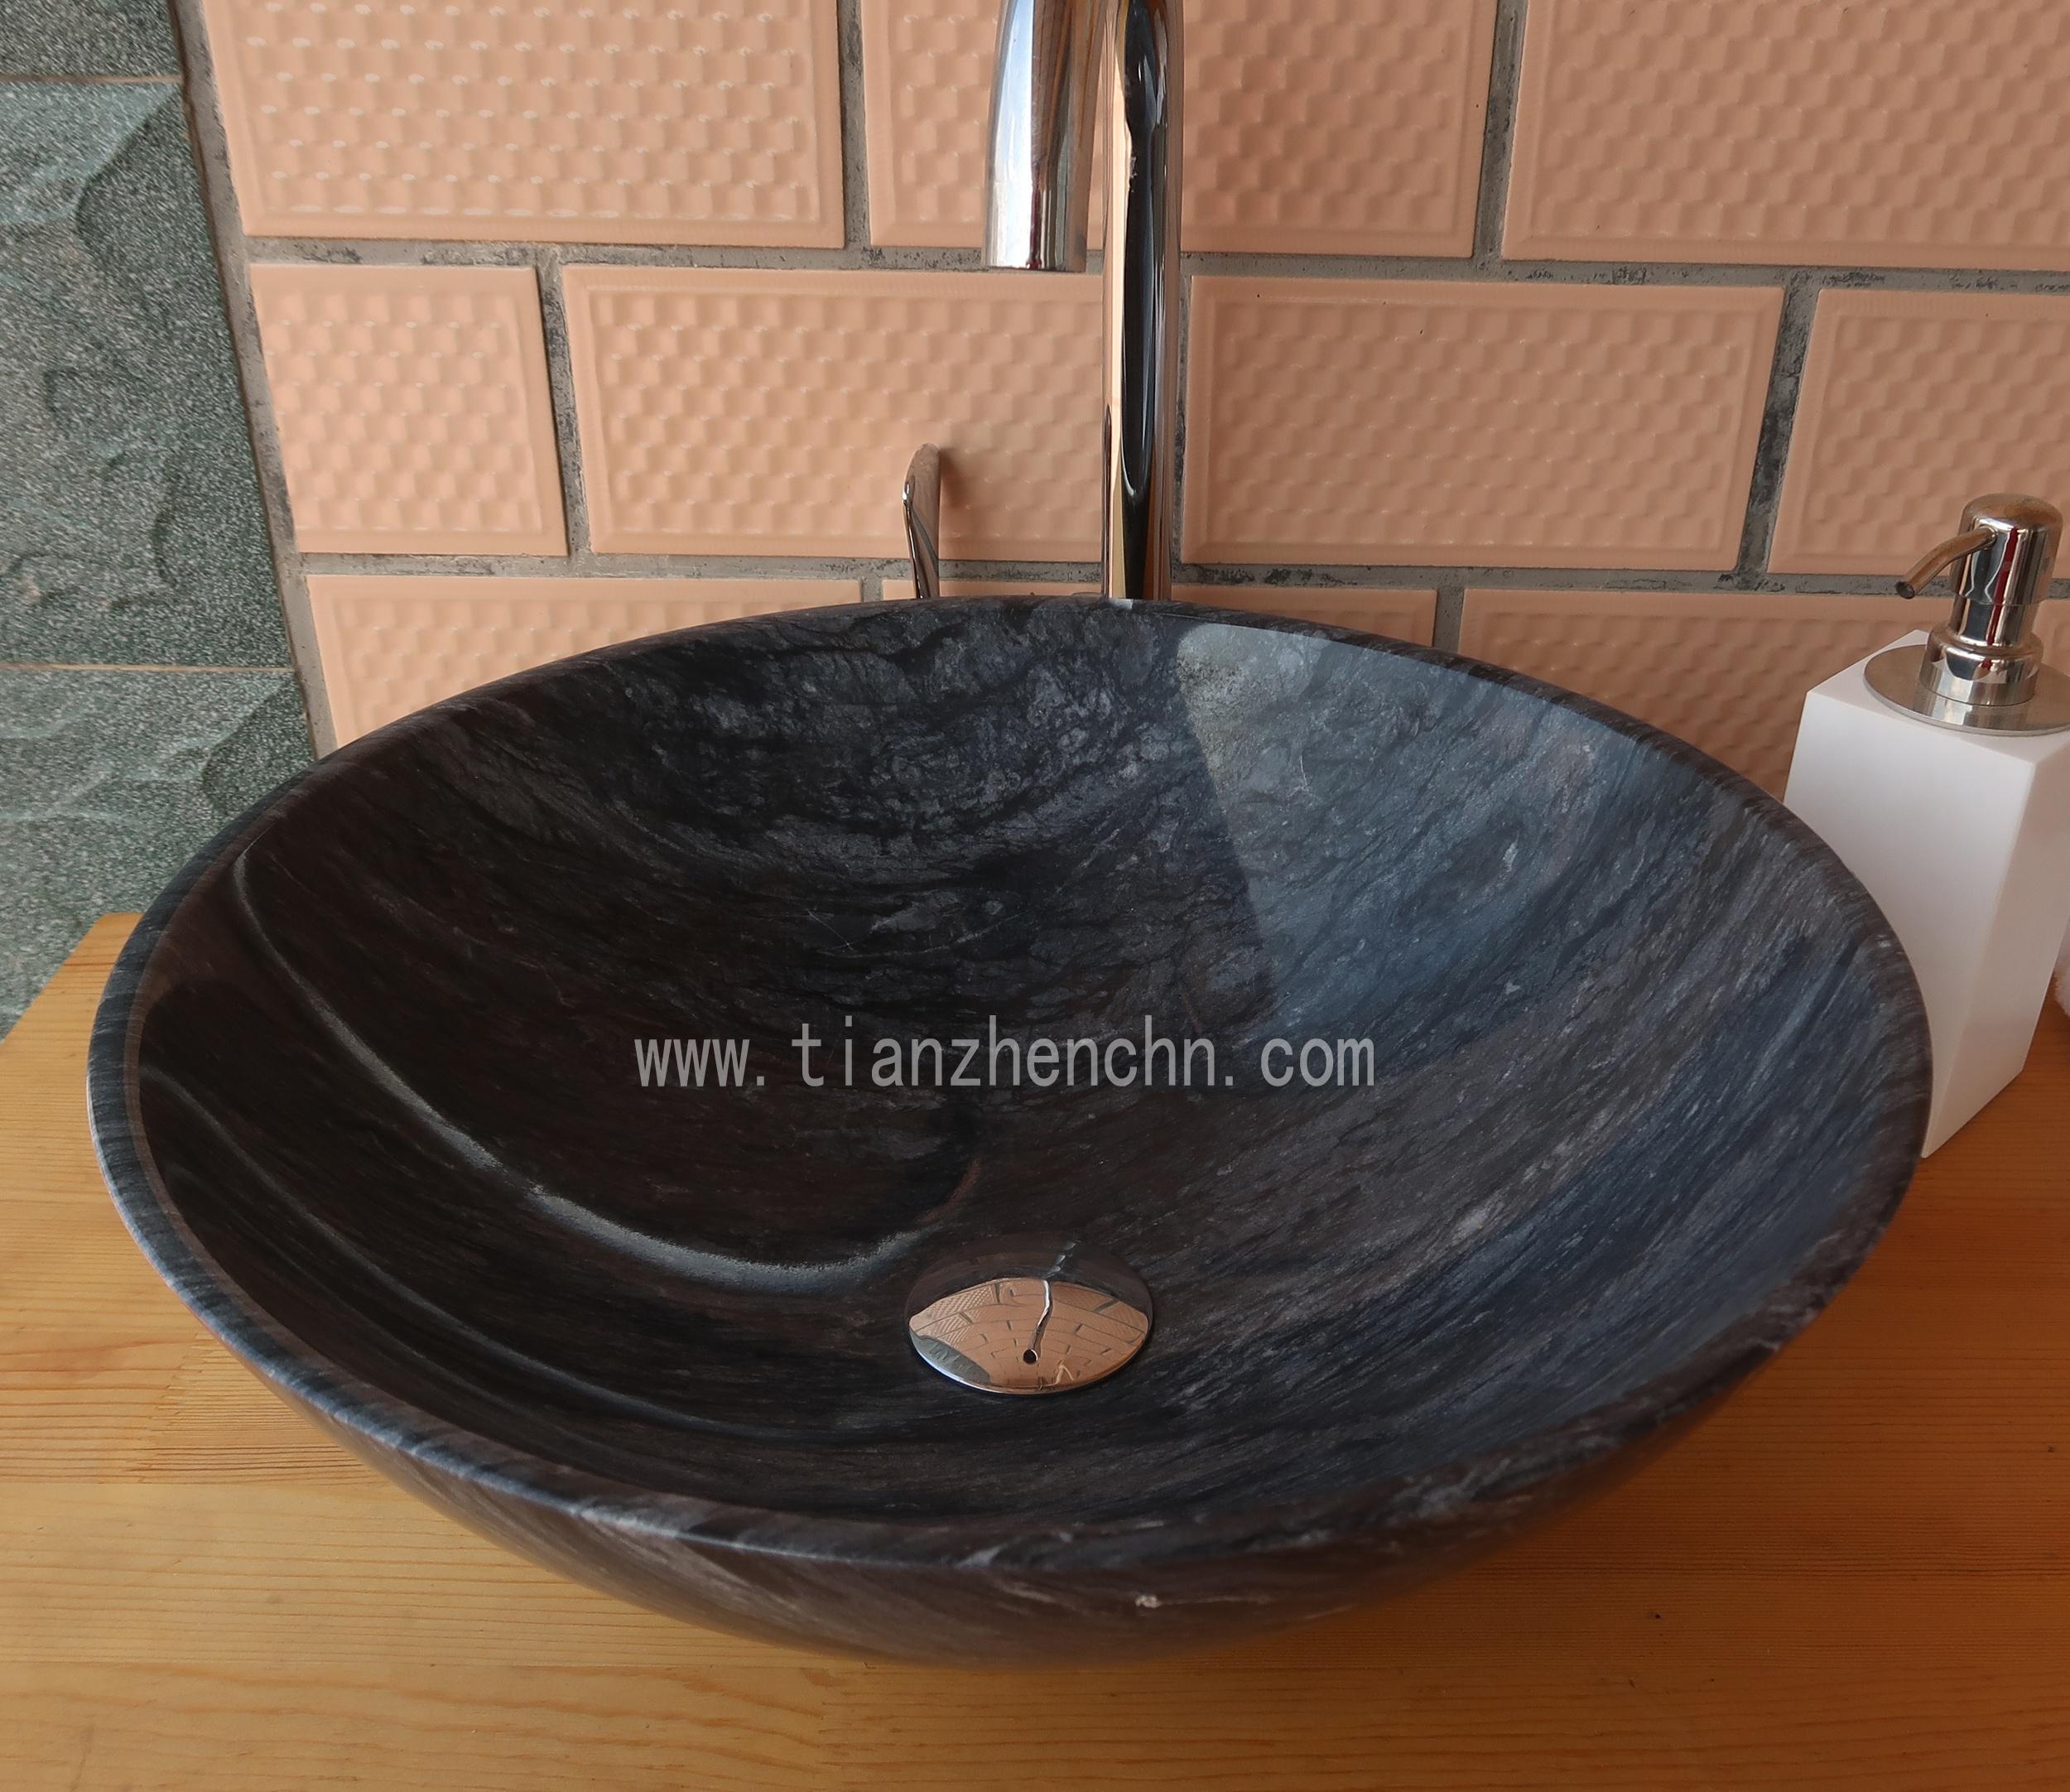 Stone Bowls Sink Buy Granite Sink Unique Bathroom Sinks Stone Bathroom Sink Product On Alibaba Com